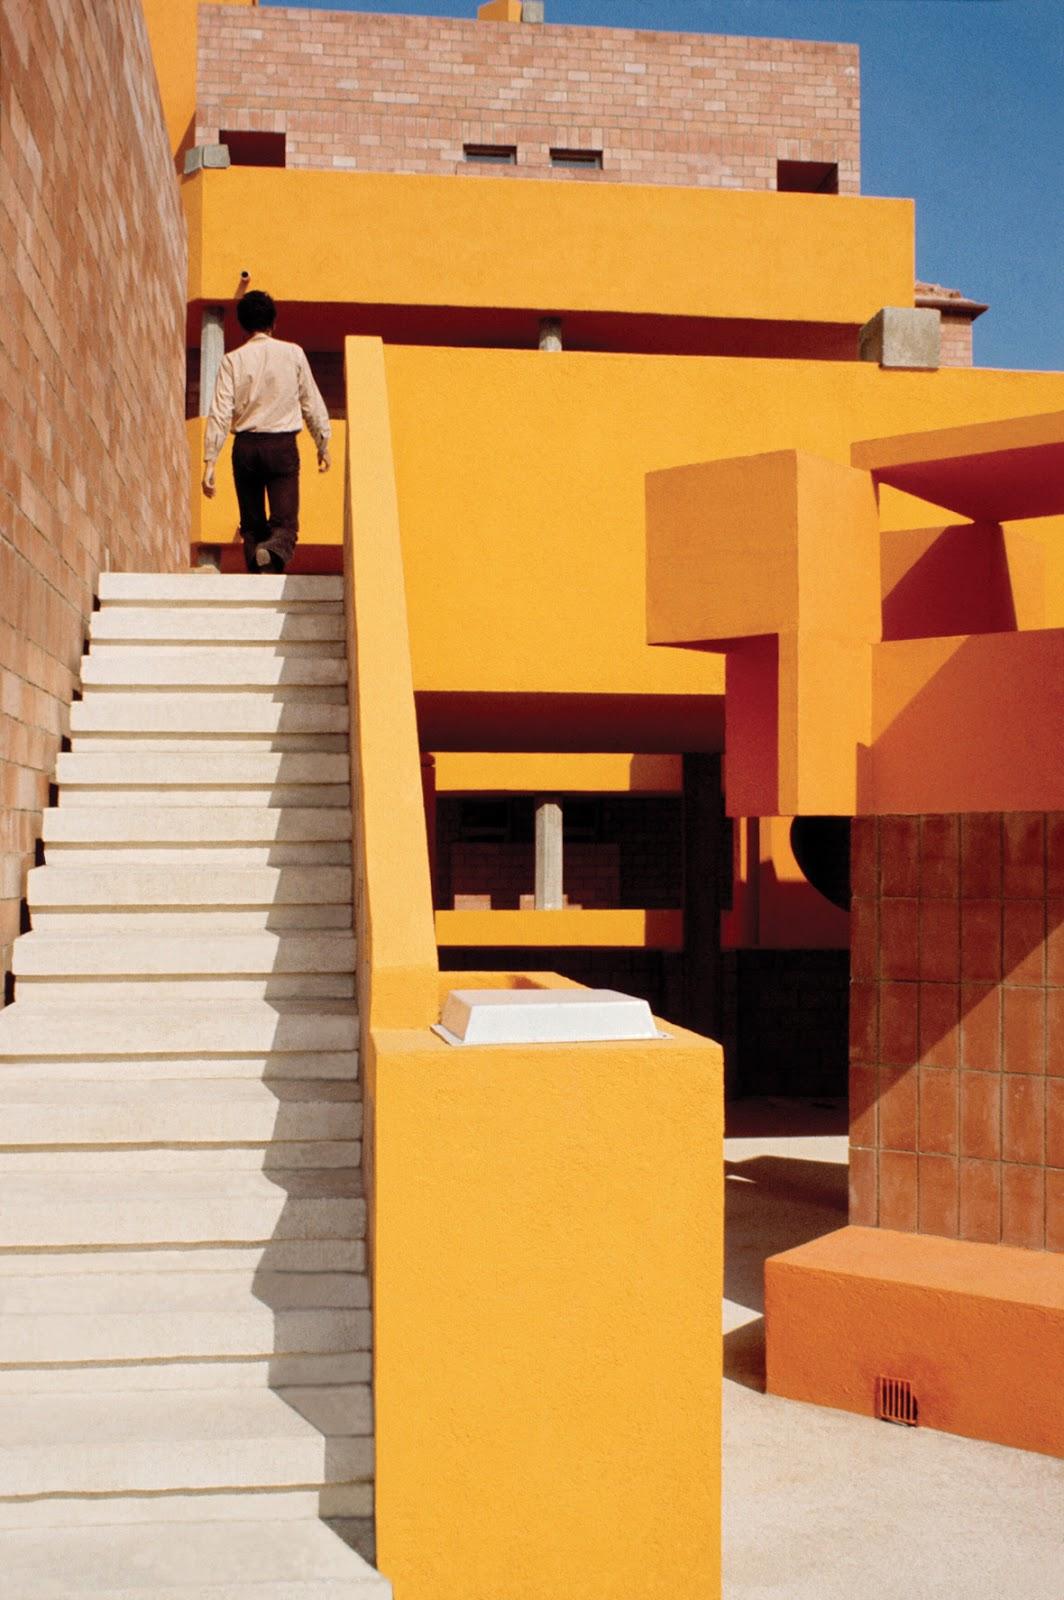 barrio gaudi neighborhood architecture by ricardo bofill spanish studio on one more good one